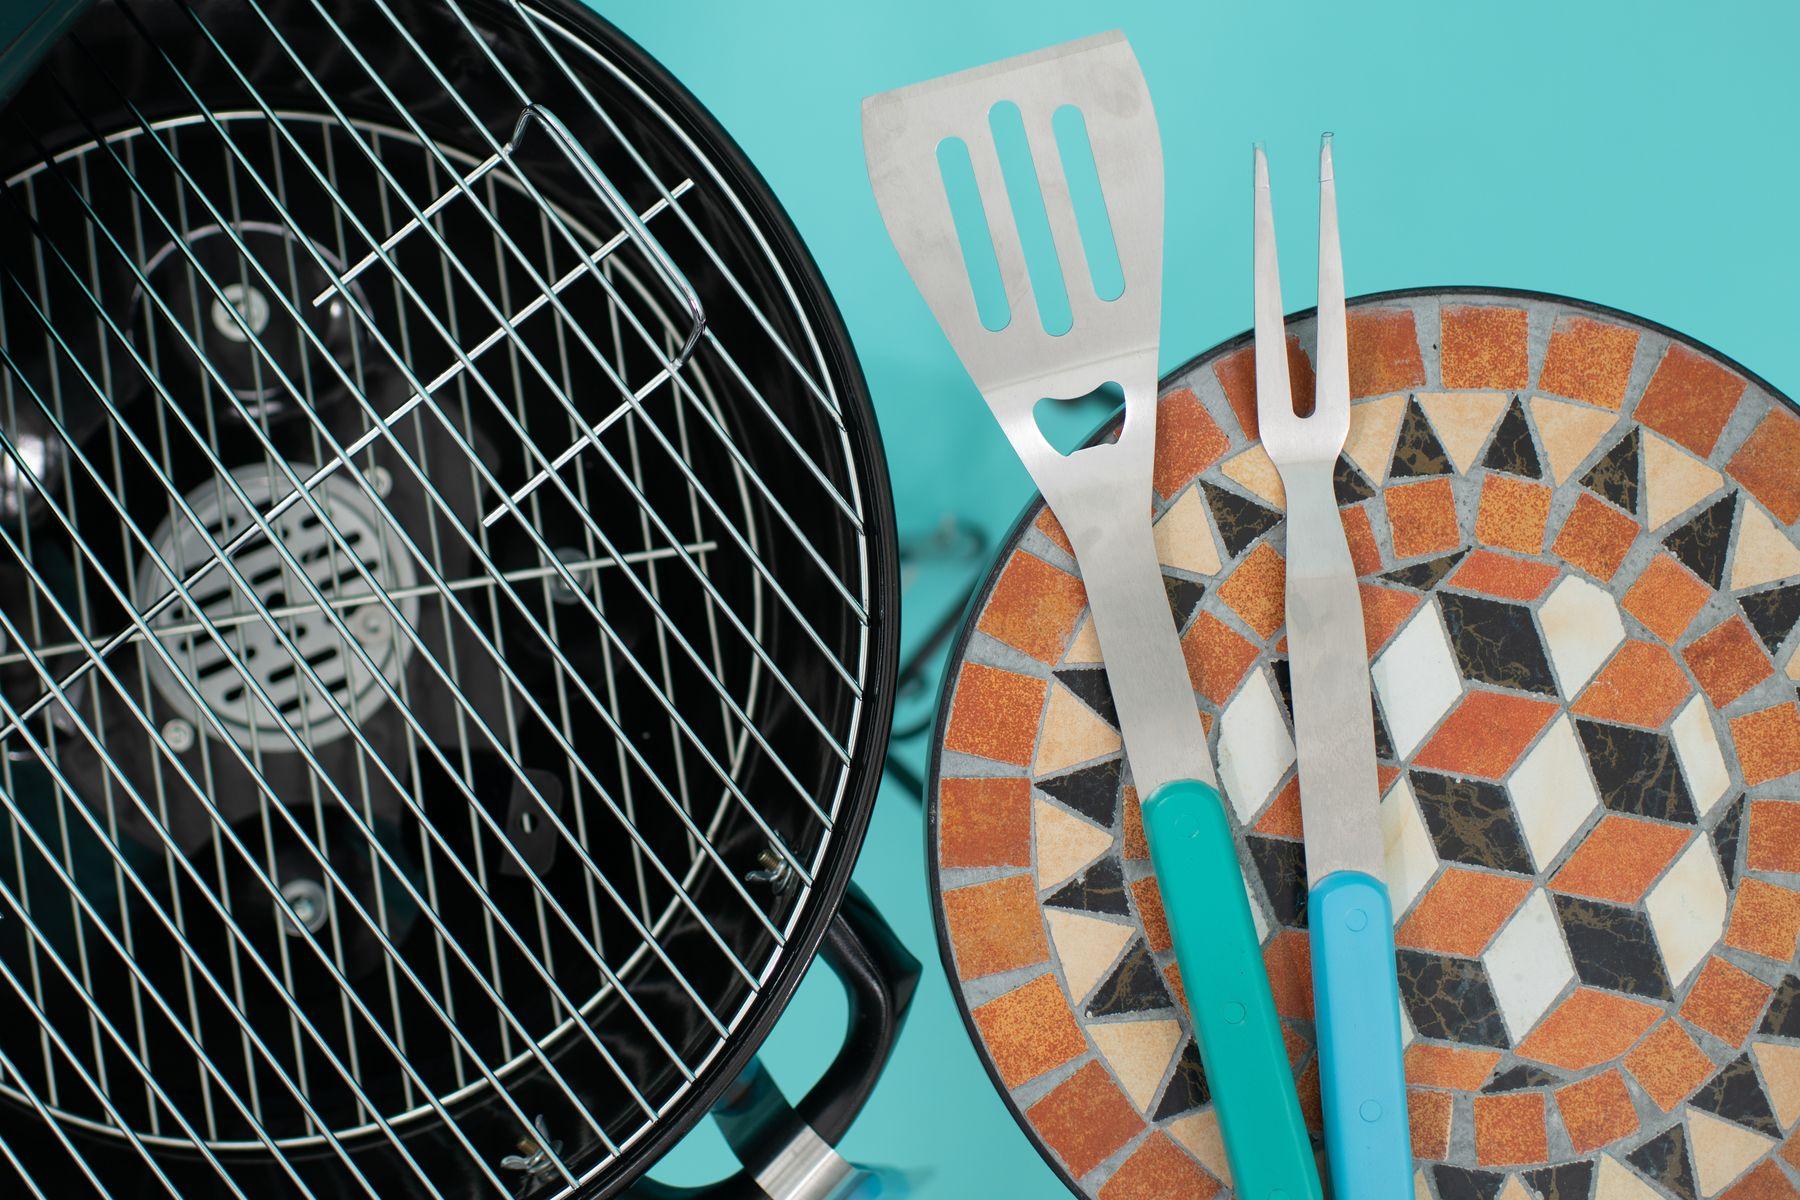 como limpar grelha de churrasqueira